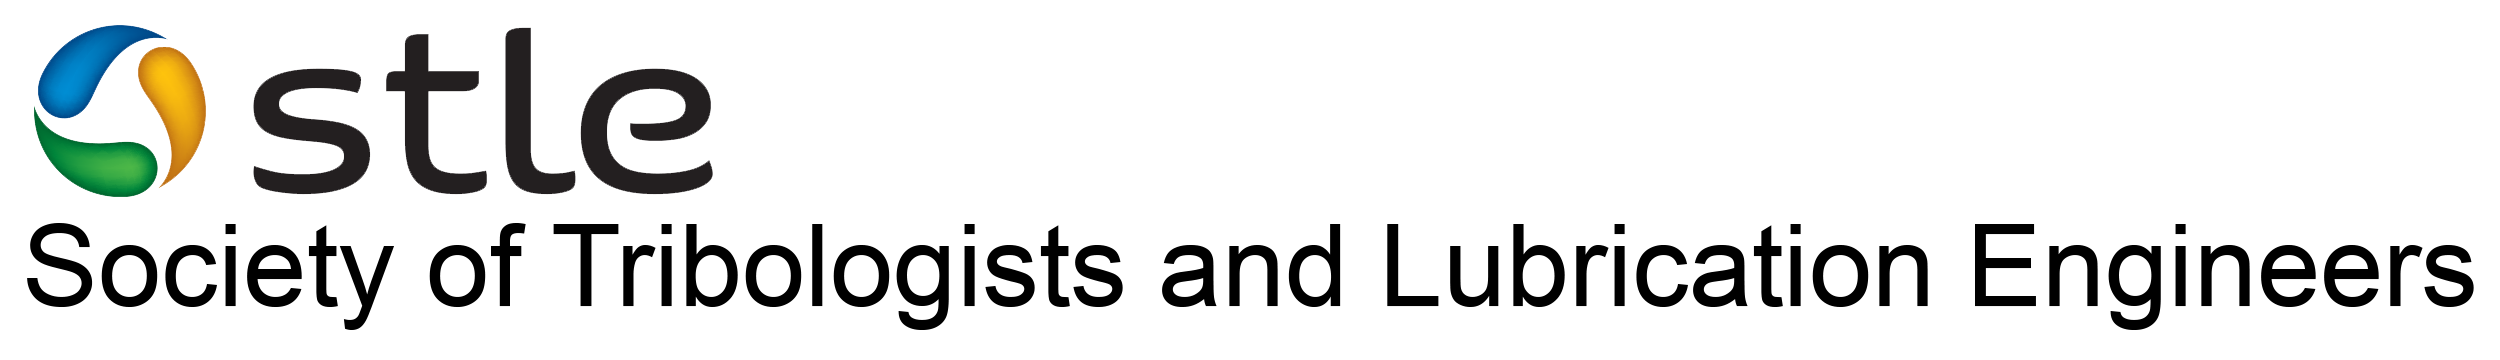 Réunion annuelle de la Society of Tribologists and Engineers. dans - - - NEWS INDUSTRIE STLE_Logo_withname_Long_transparentV2